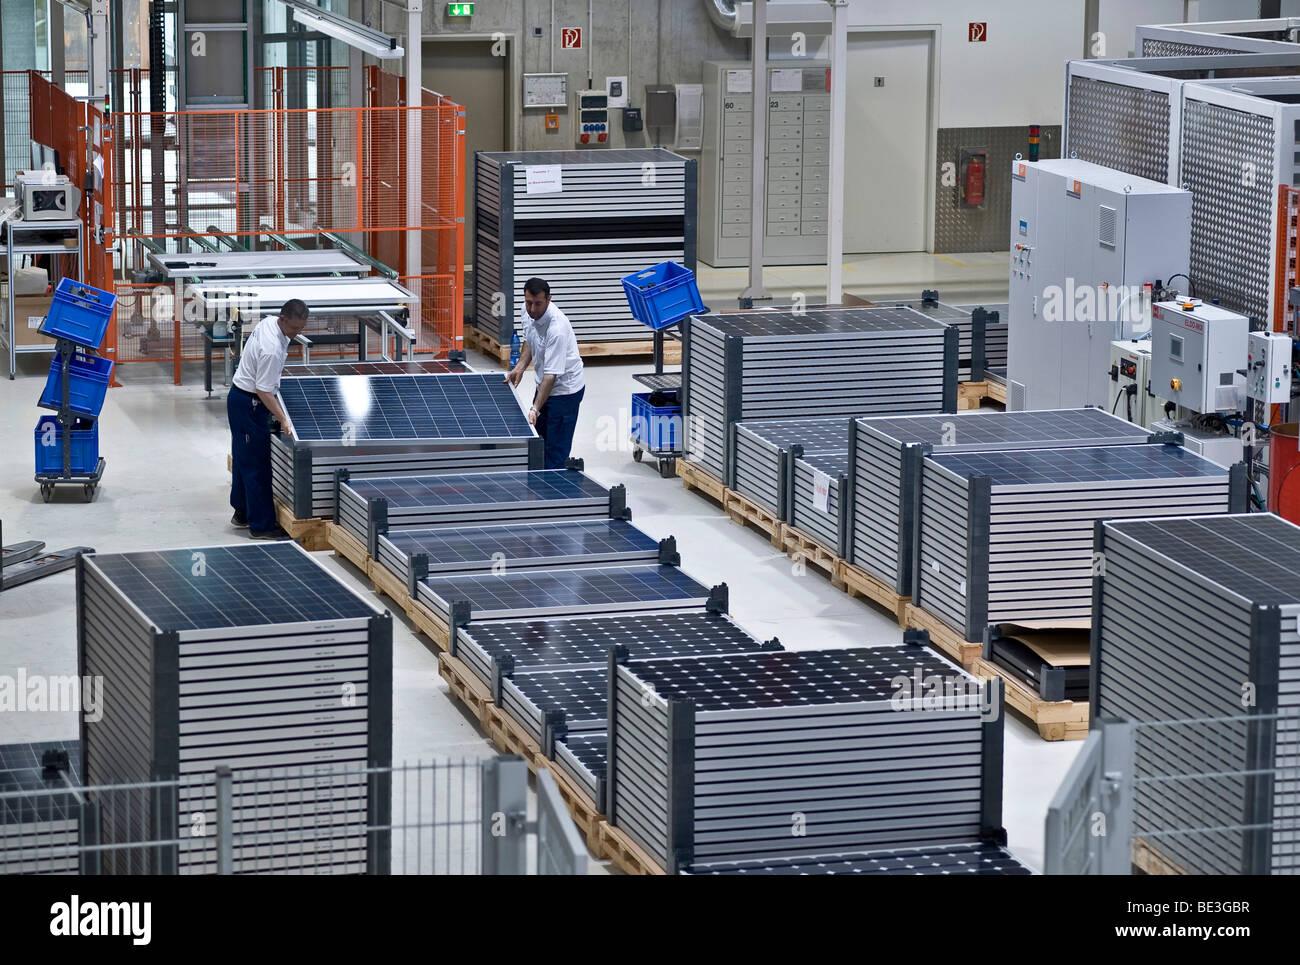 Storage, production of solar modules at SOLON SE, Berlin-Adlershof, Germany, Europe - Stock Image